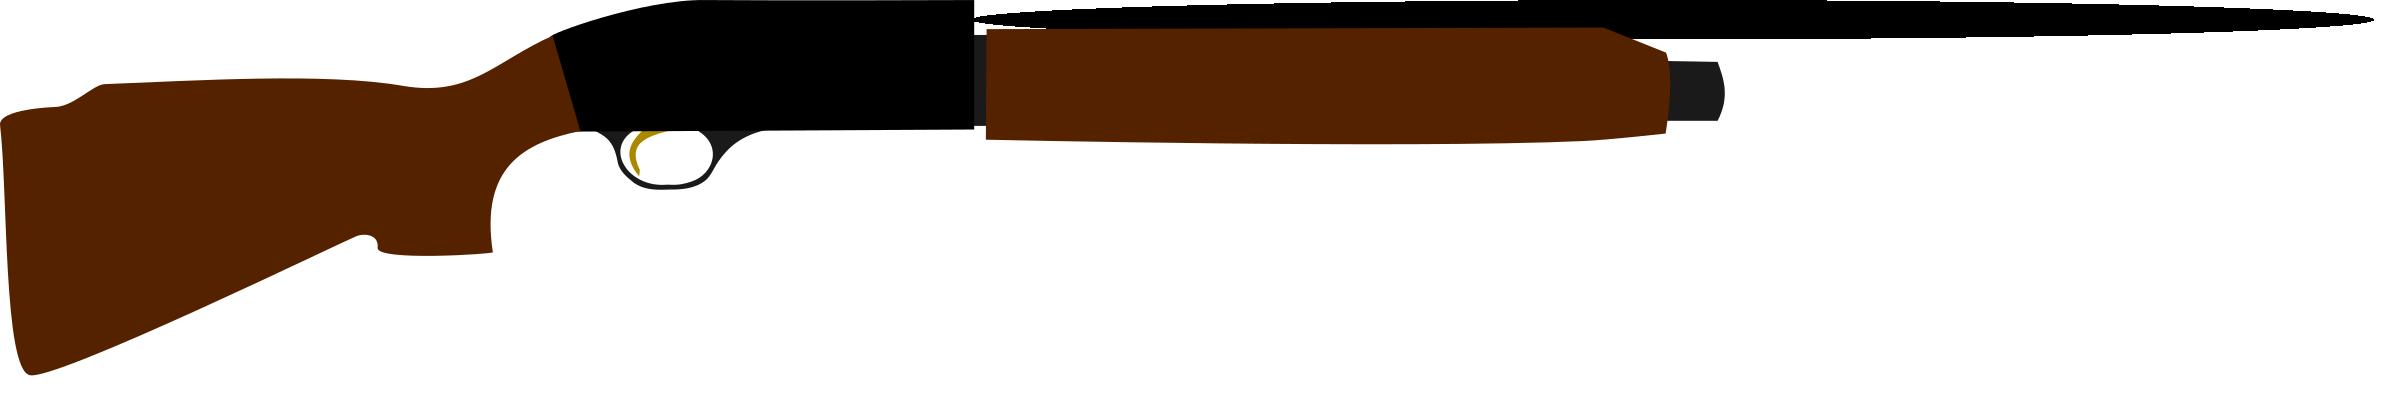 Clipart gun transparent background. Shotguns shotgun